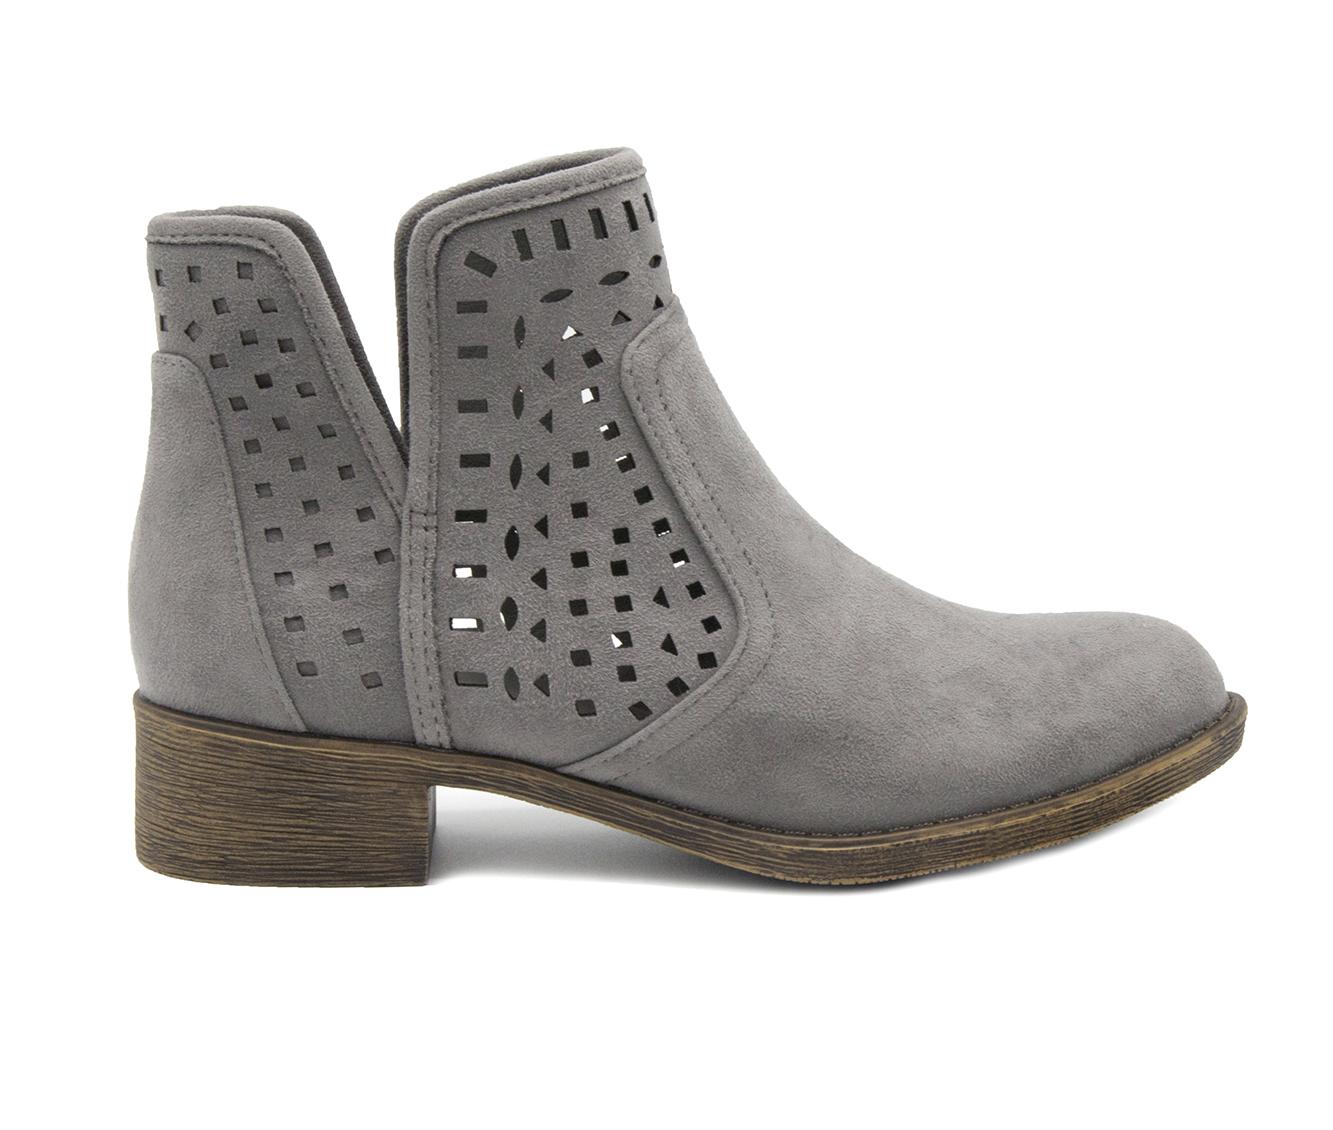 Sugar Calico Women's Boot (Gray Canvas)